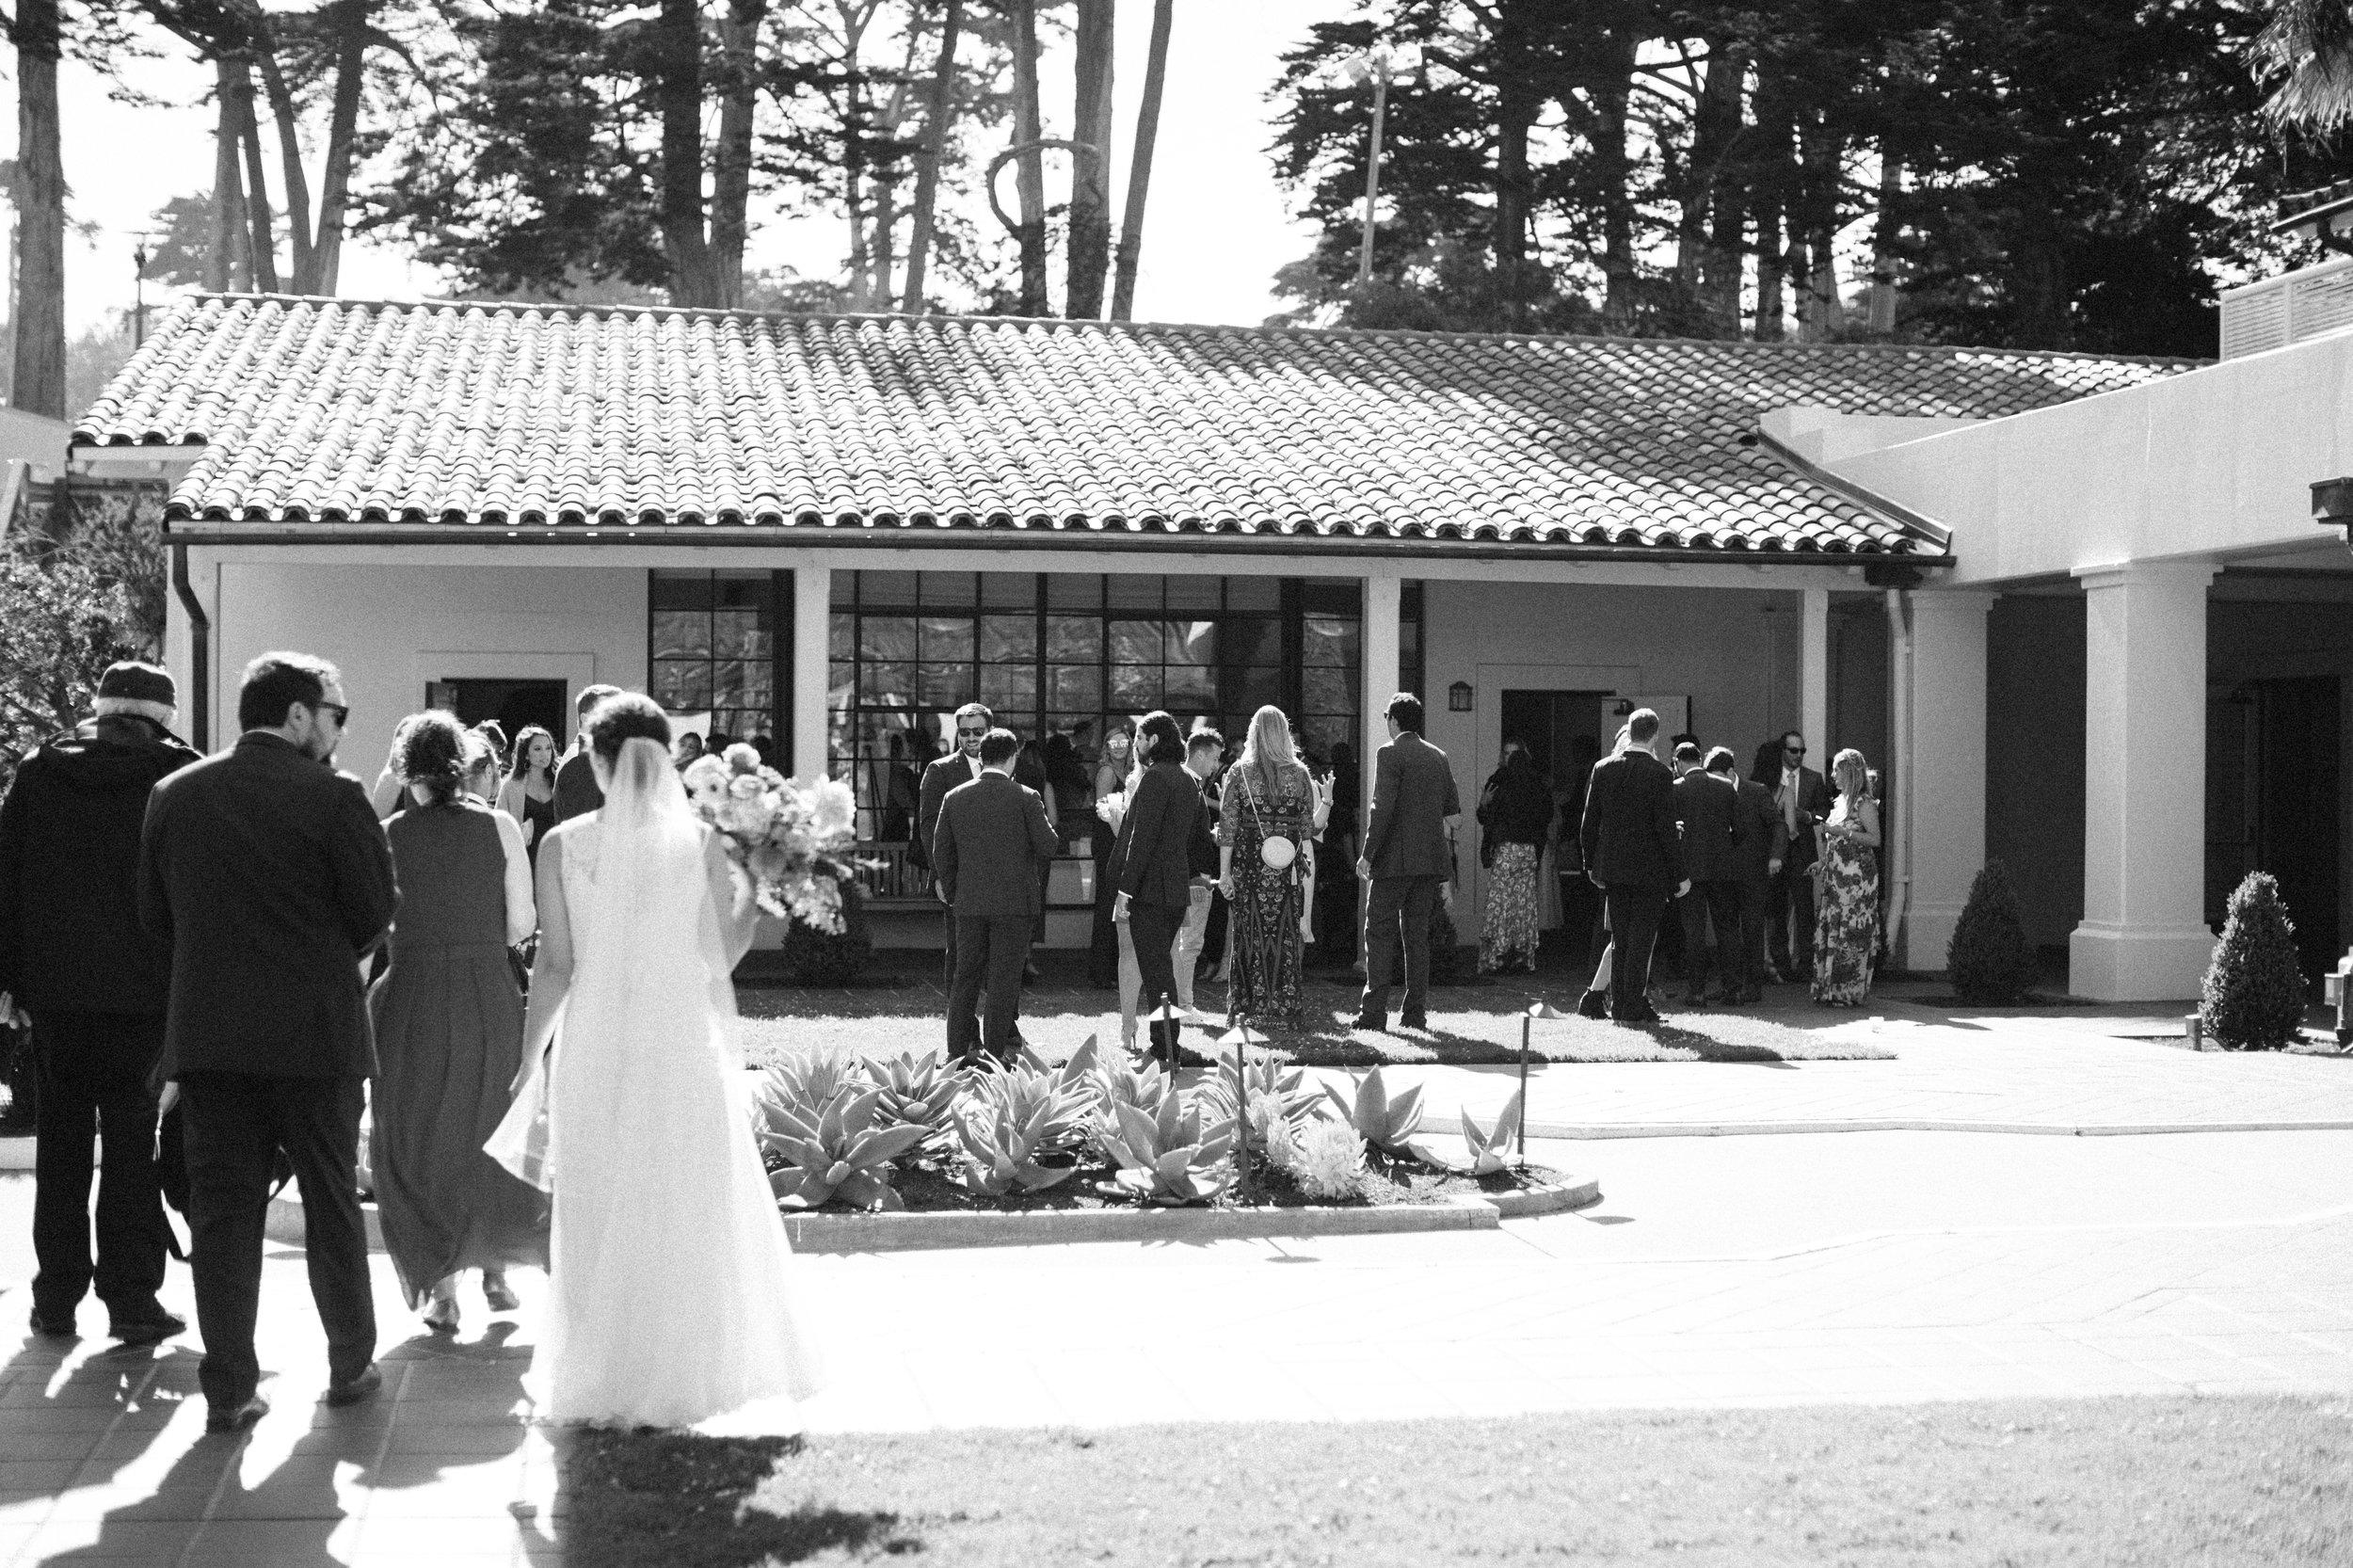 Tucker_Kristina_Wedding_Presidio_San_Francisco_Abigail_Malone_Photography-791.jpg